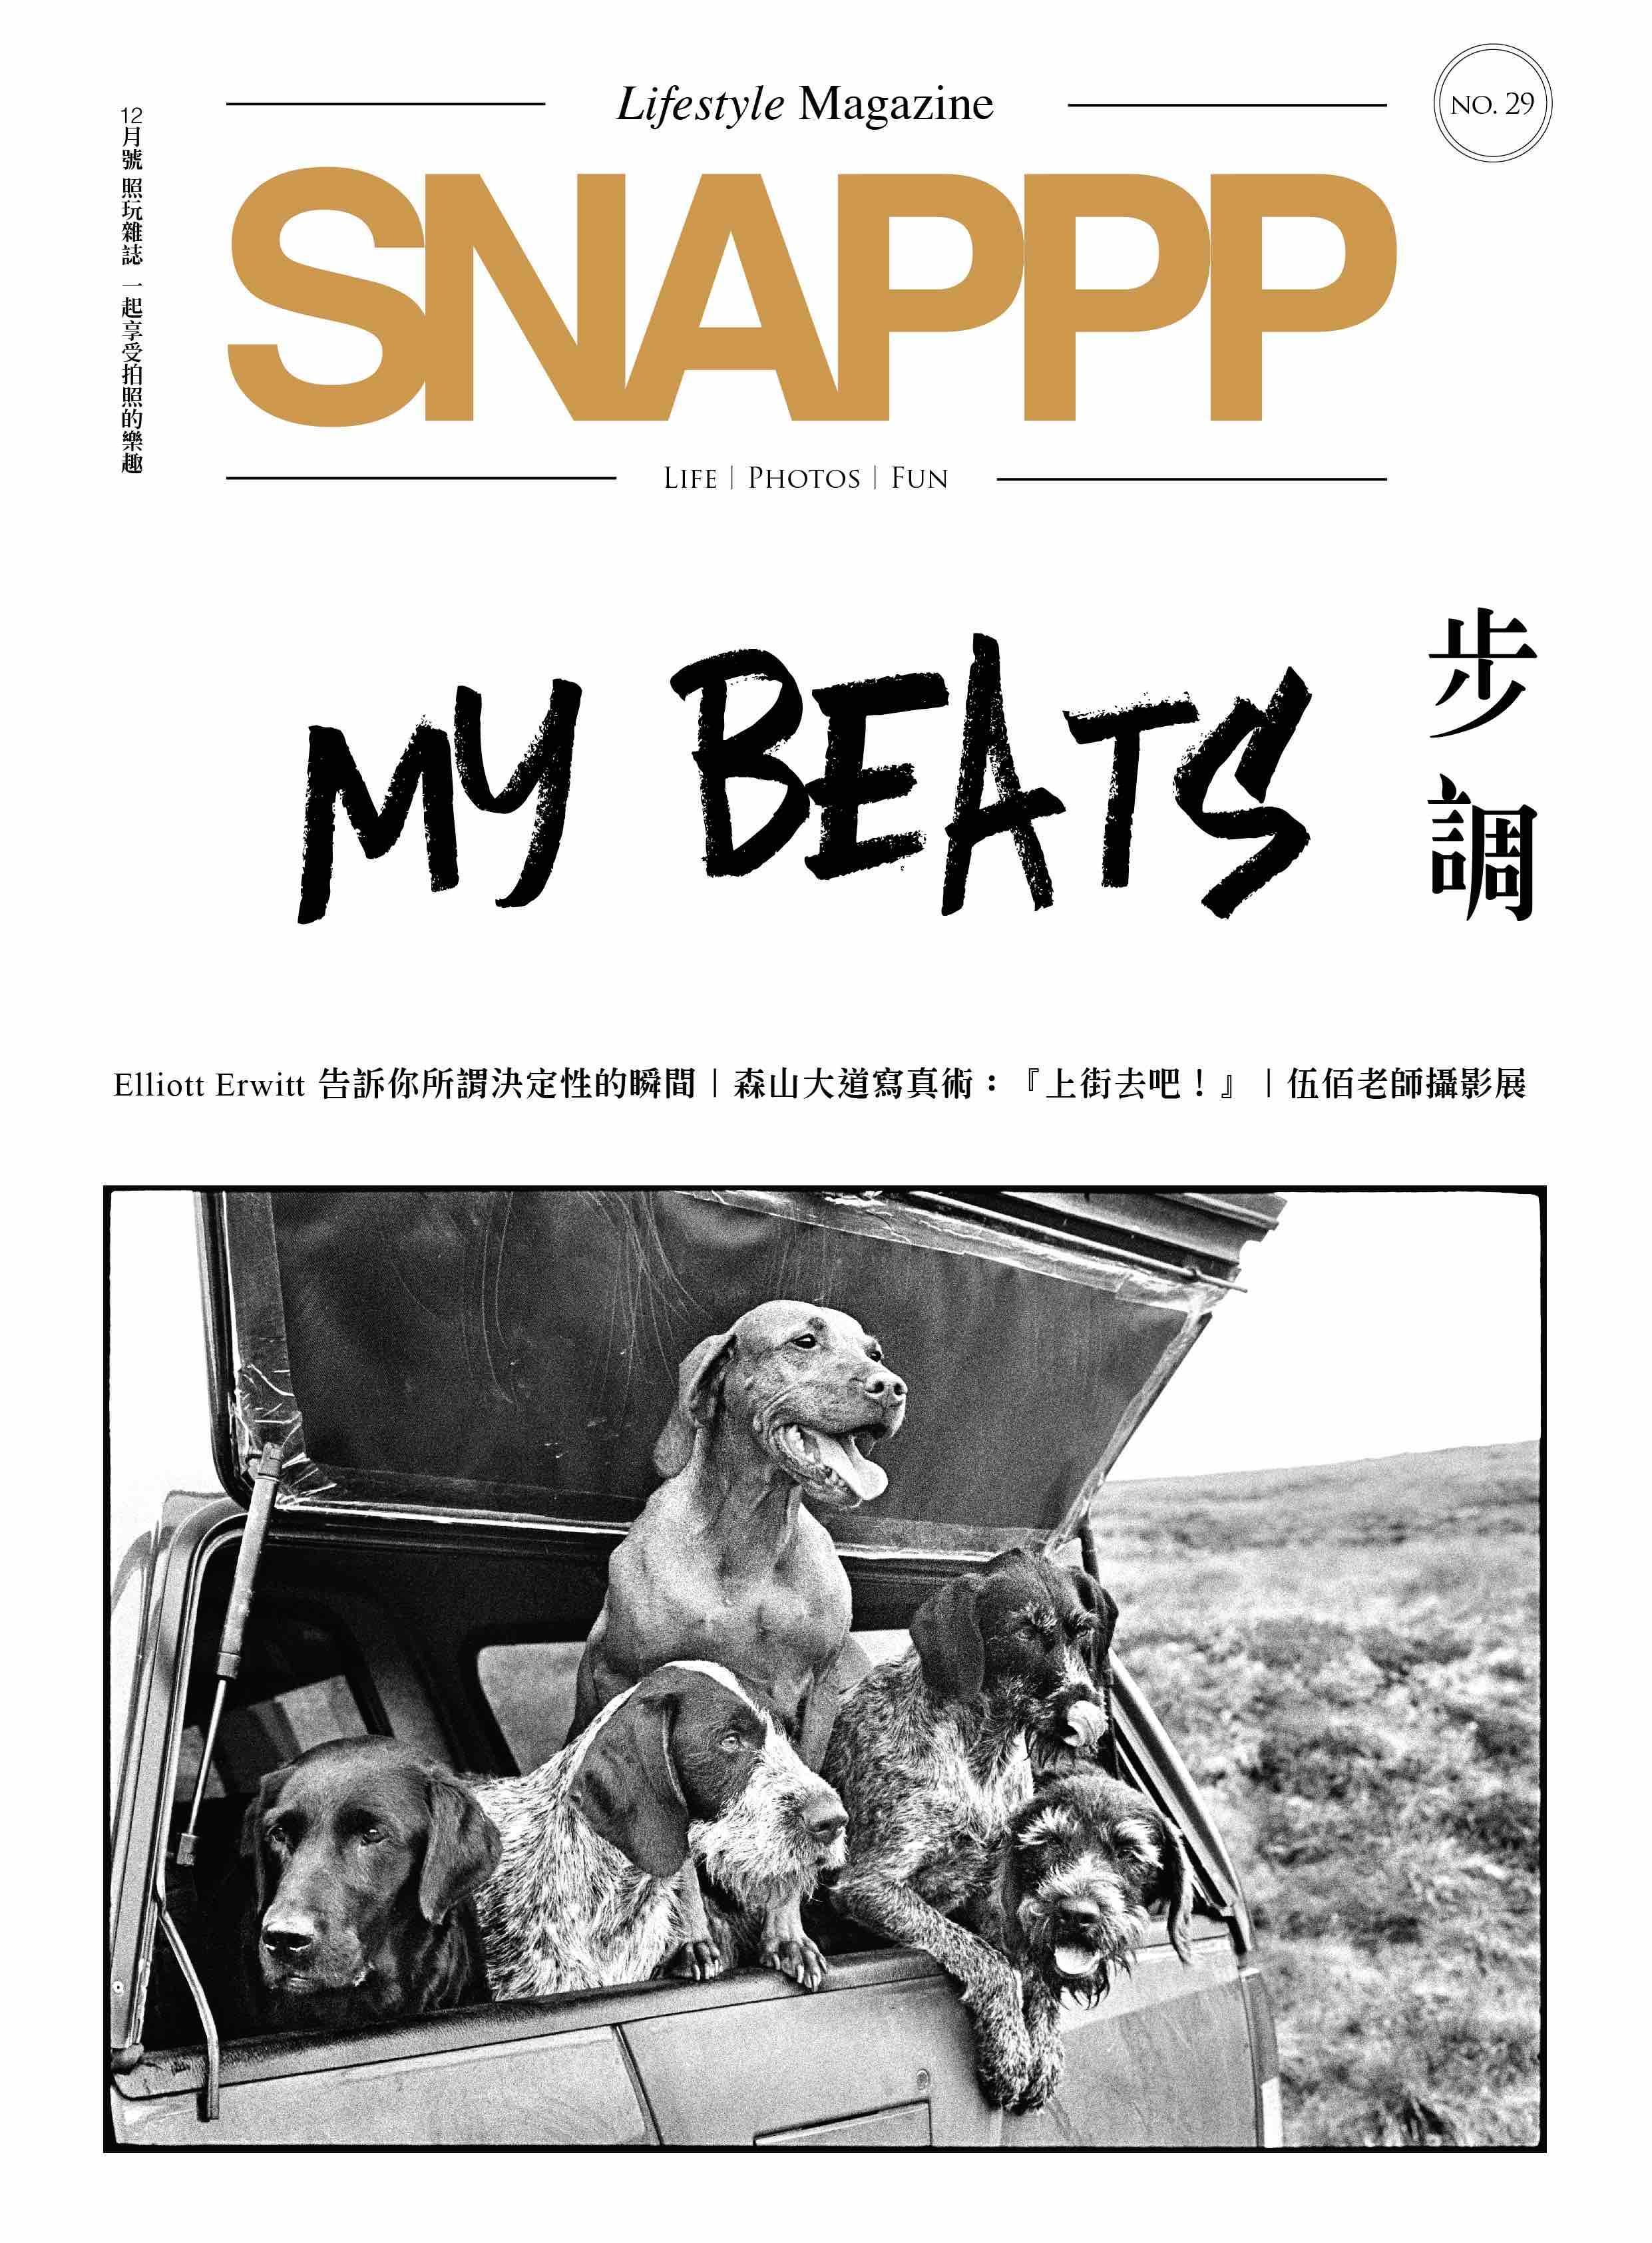 SNAPPP-NO29 COVER-ver1.jpg